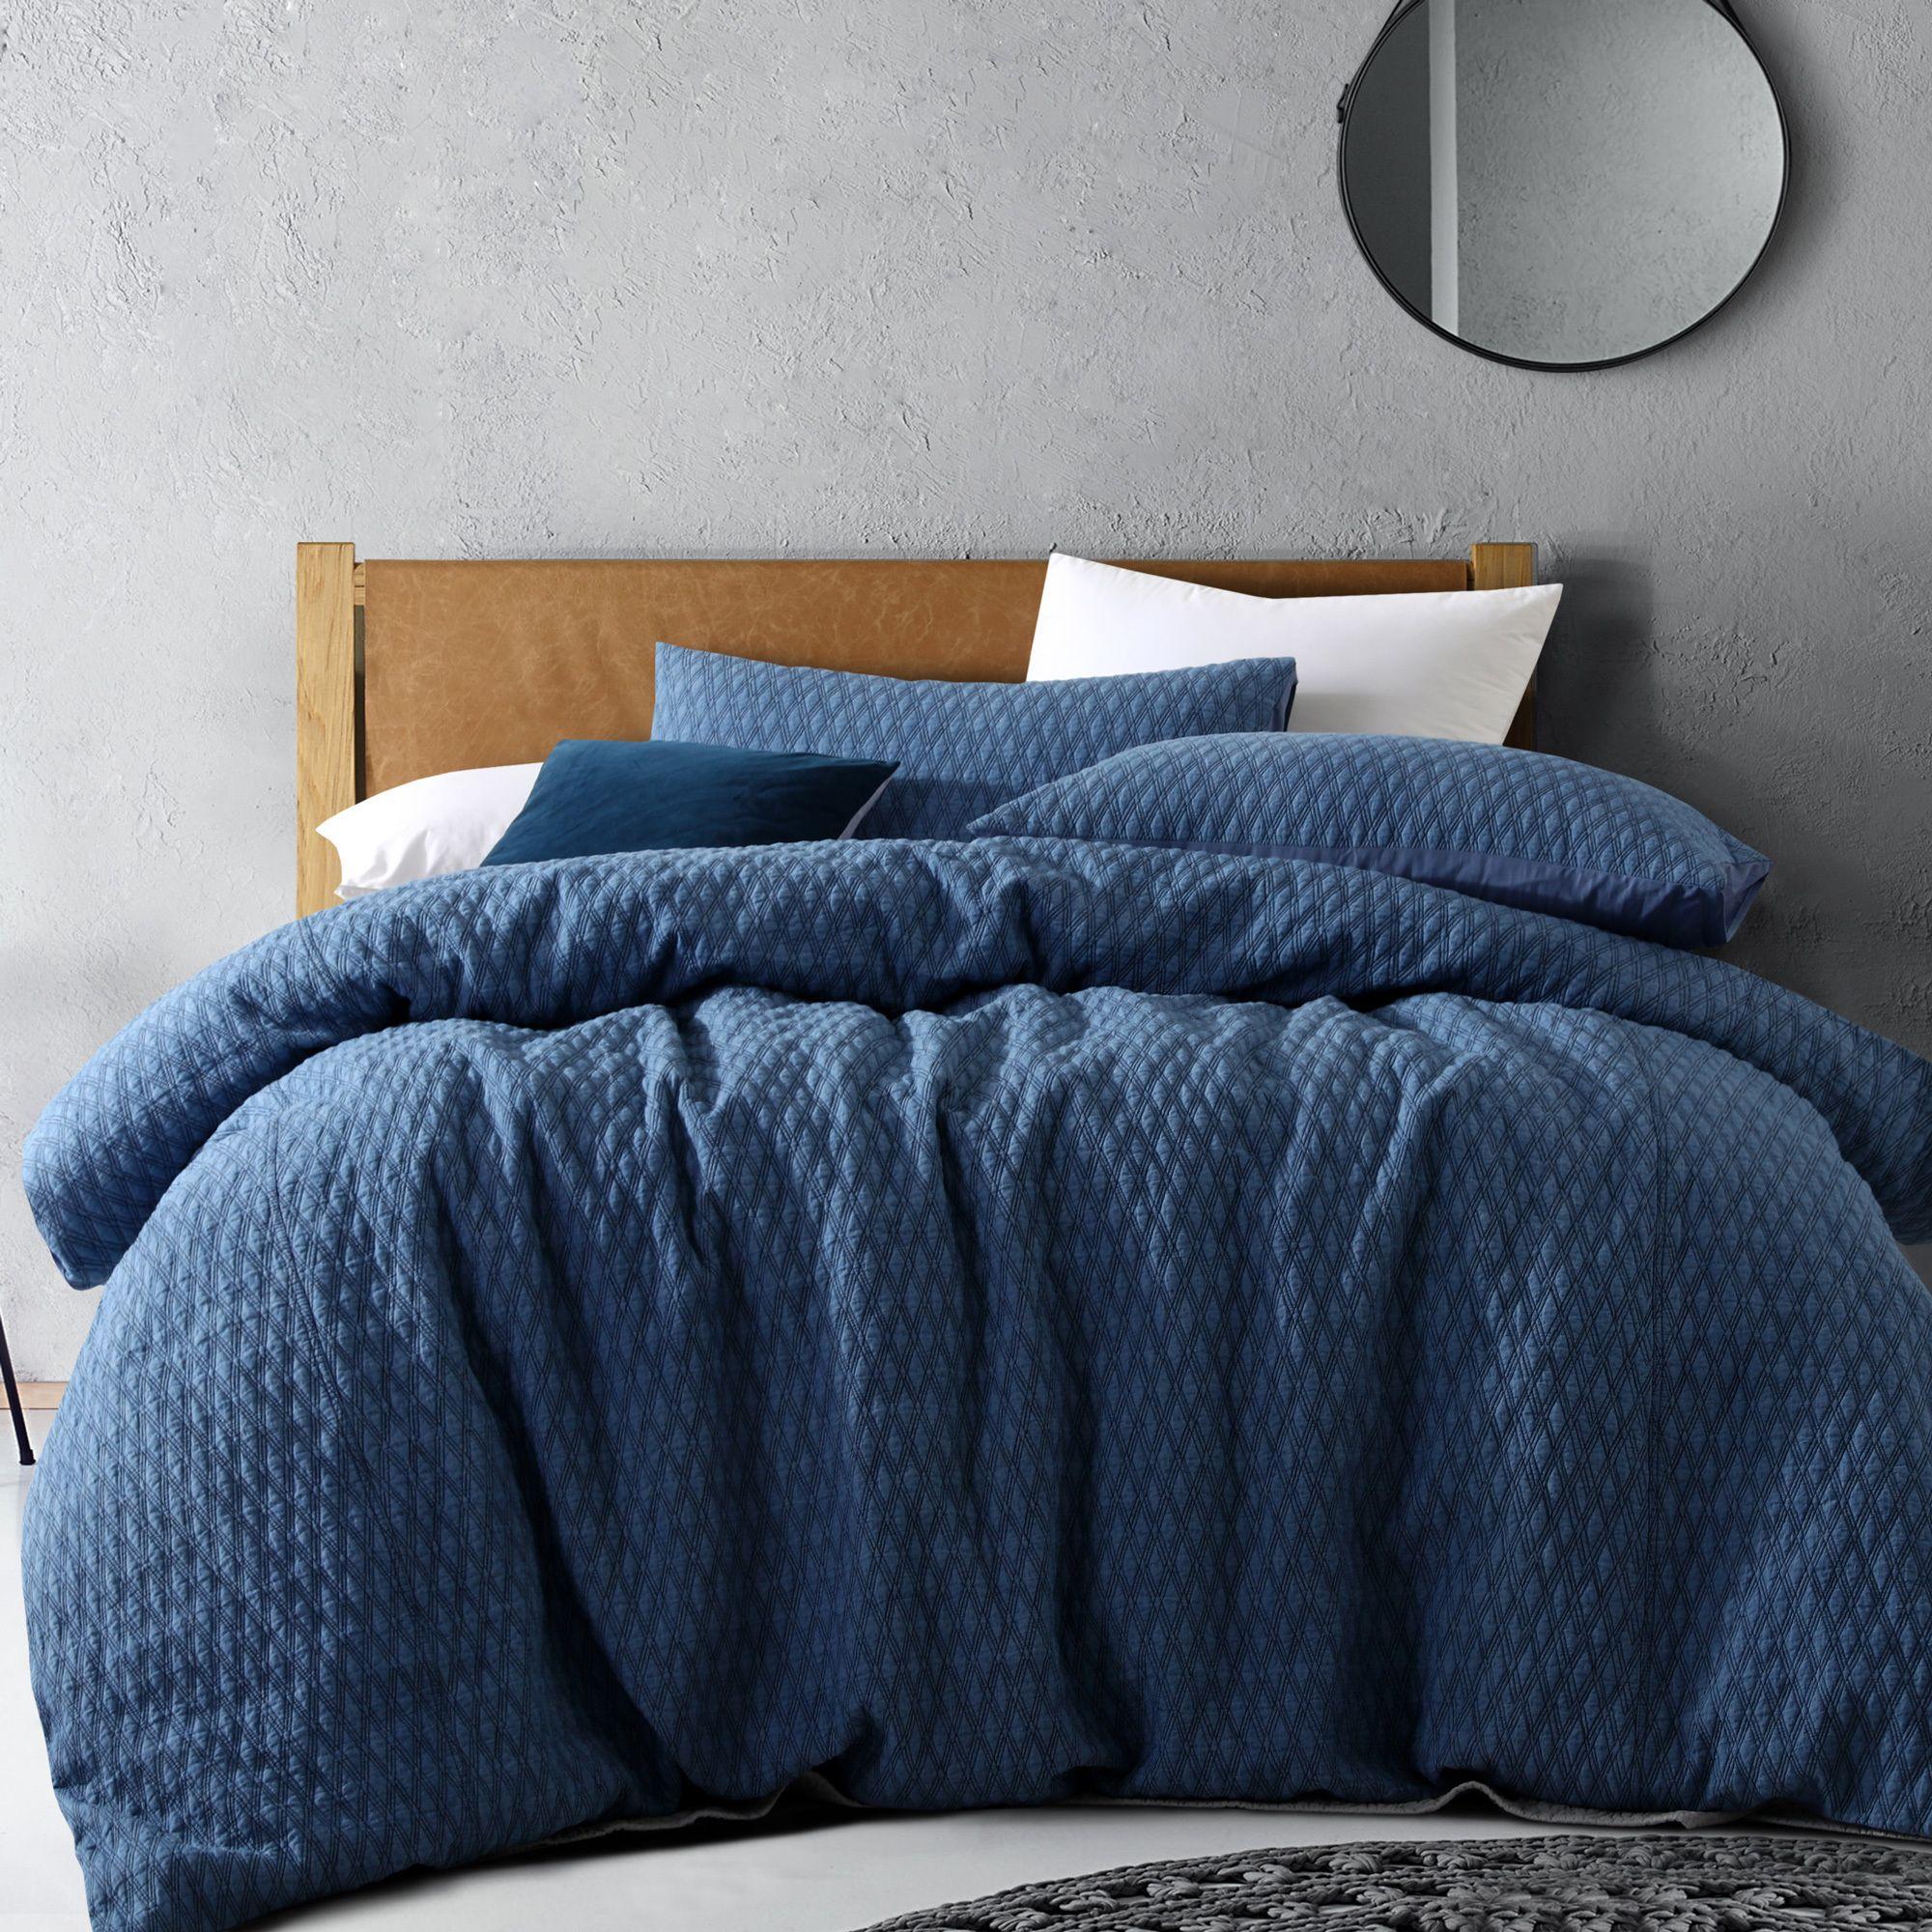 Stonewashed Denim Quilt Cover Set By Vintage Design Homewares Zanui Quilt Cover Sets Cotton Quilt Covers Velvet Quilt Cover